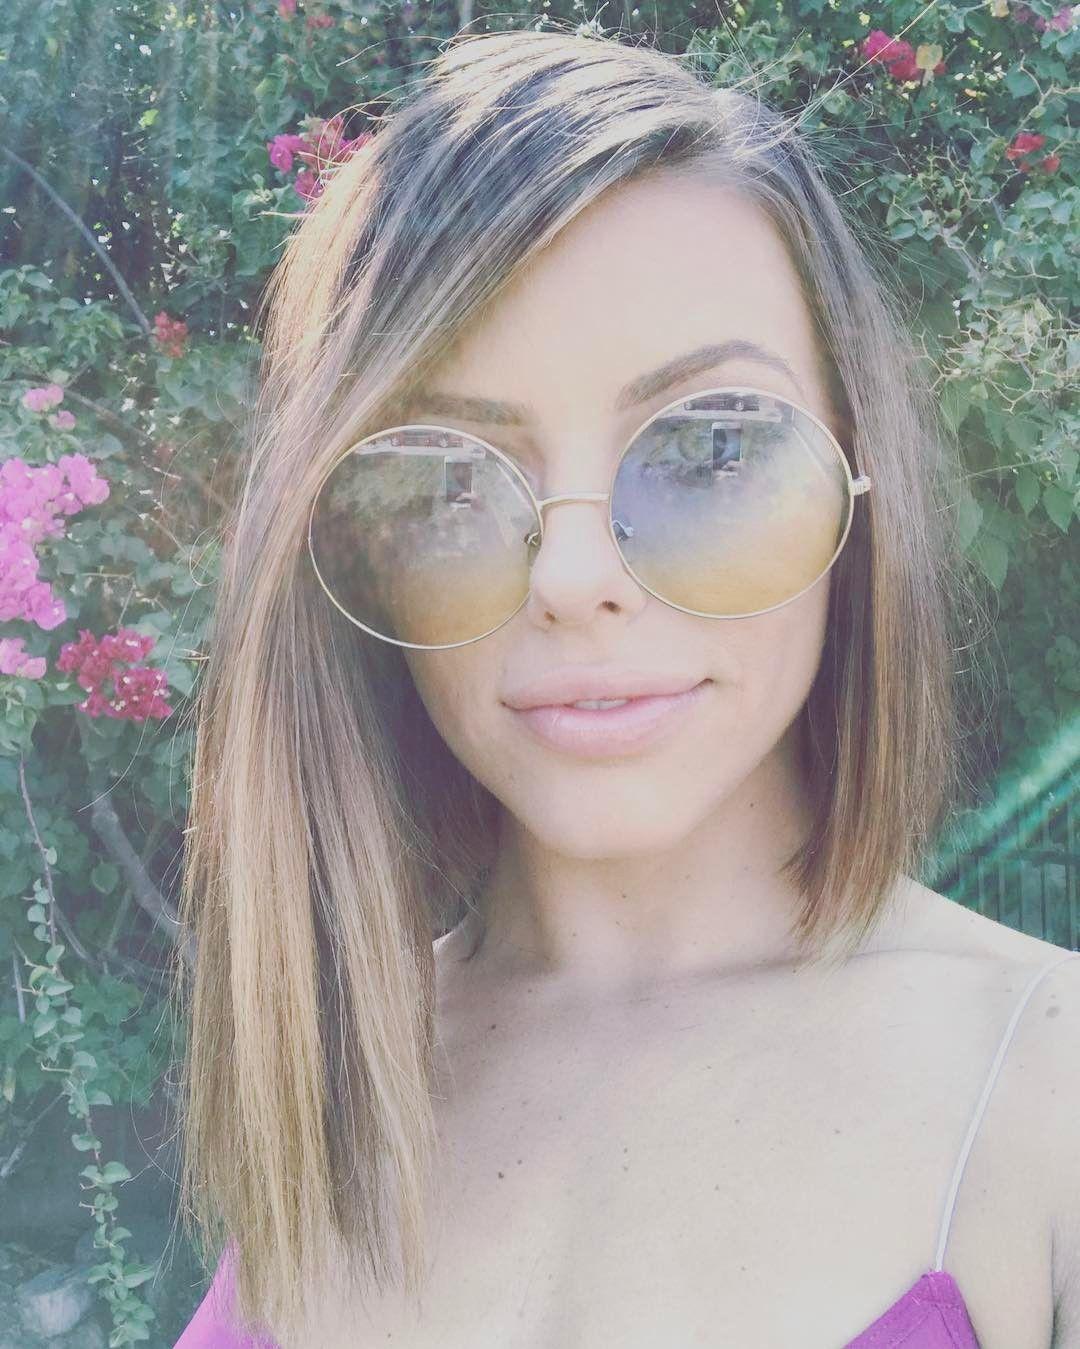 Instagram Adriana Chechik nude photos 2019